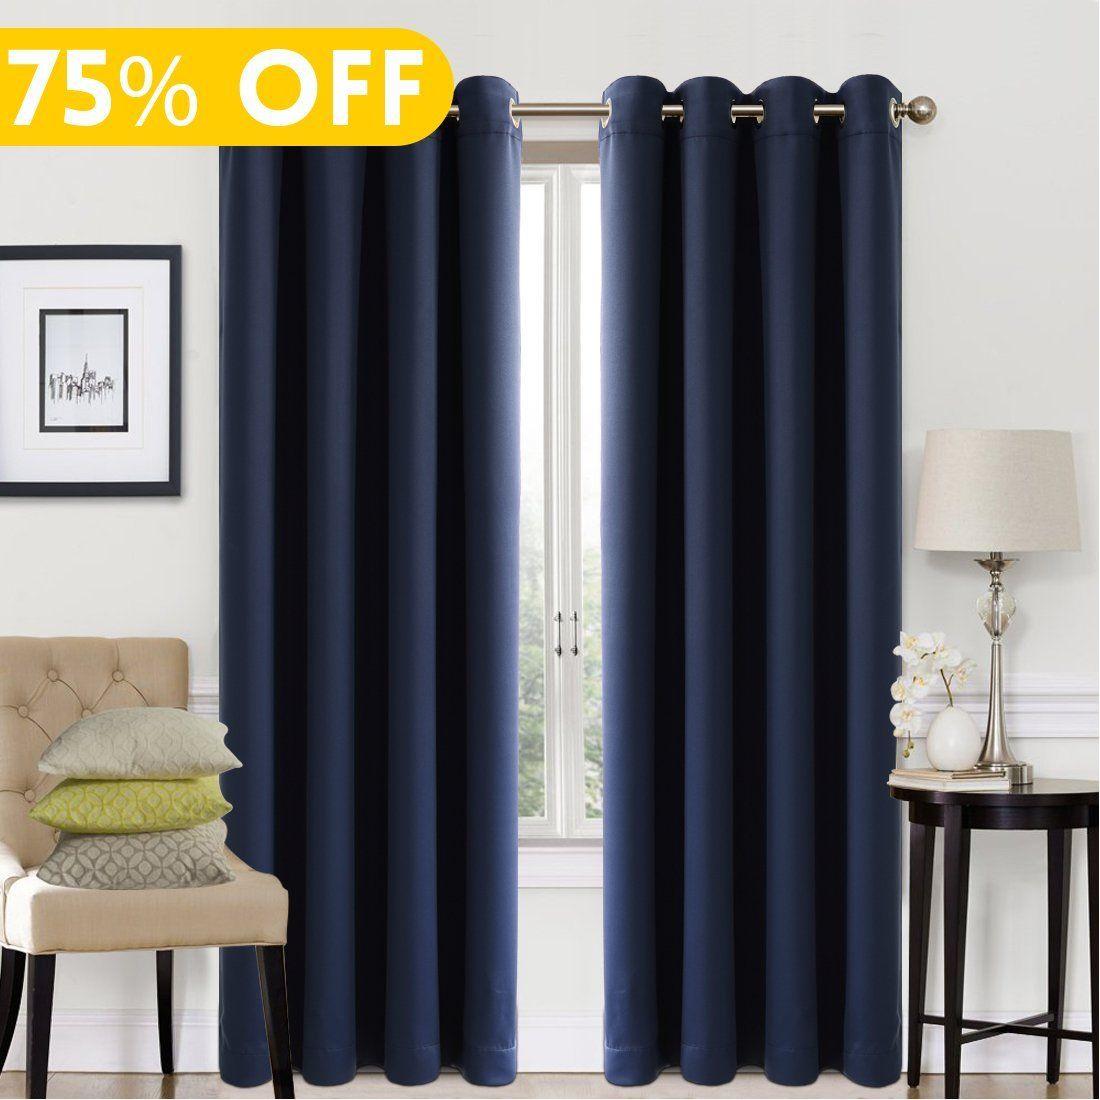 Blackout Window Curtain Panel Grommet Top Drapes 2 Set Room Darkening